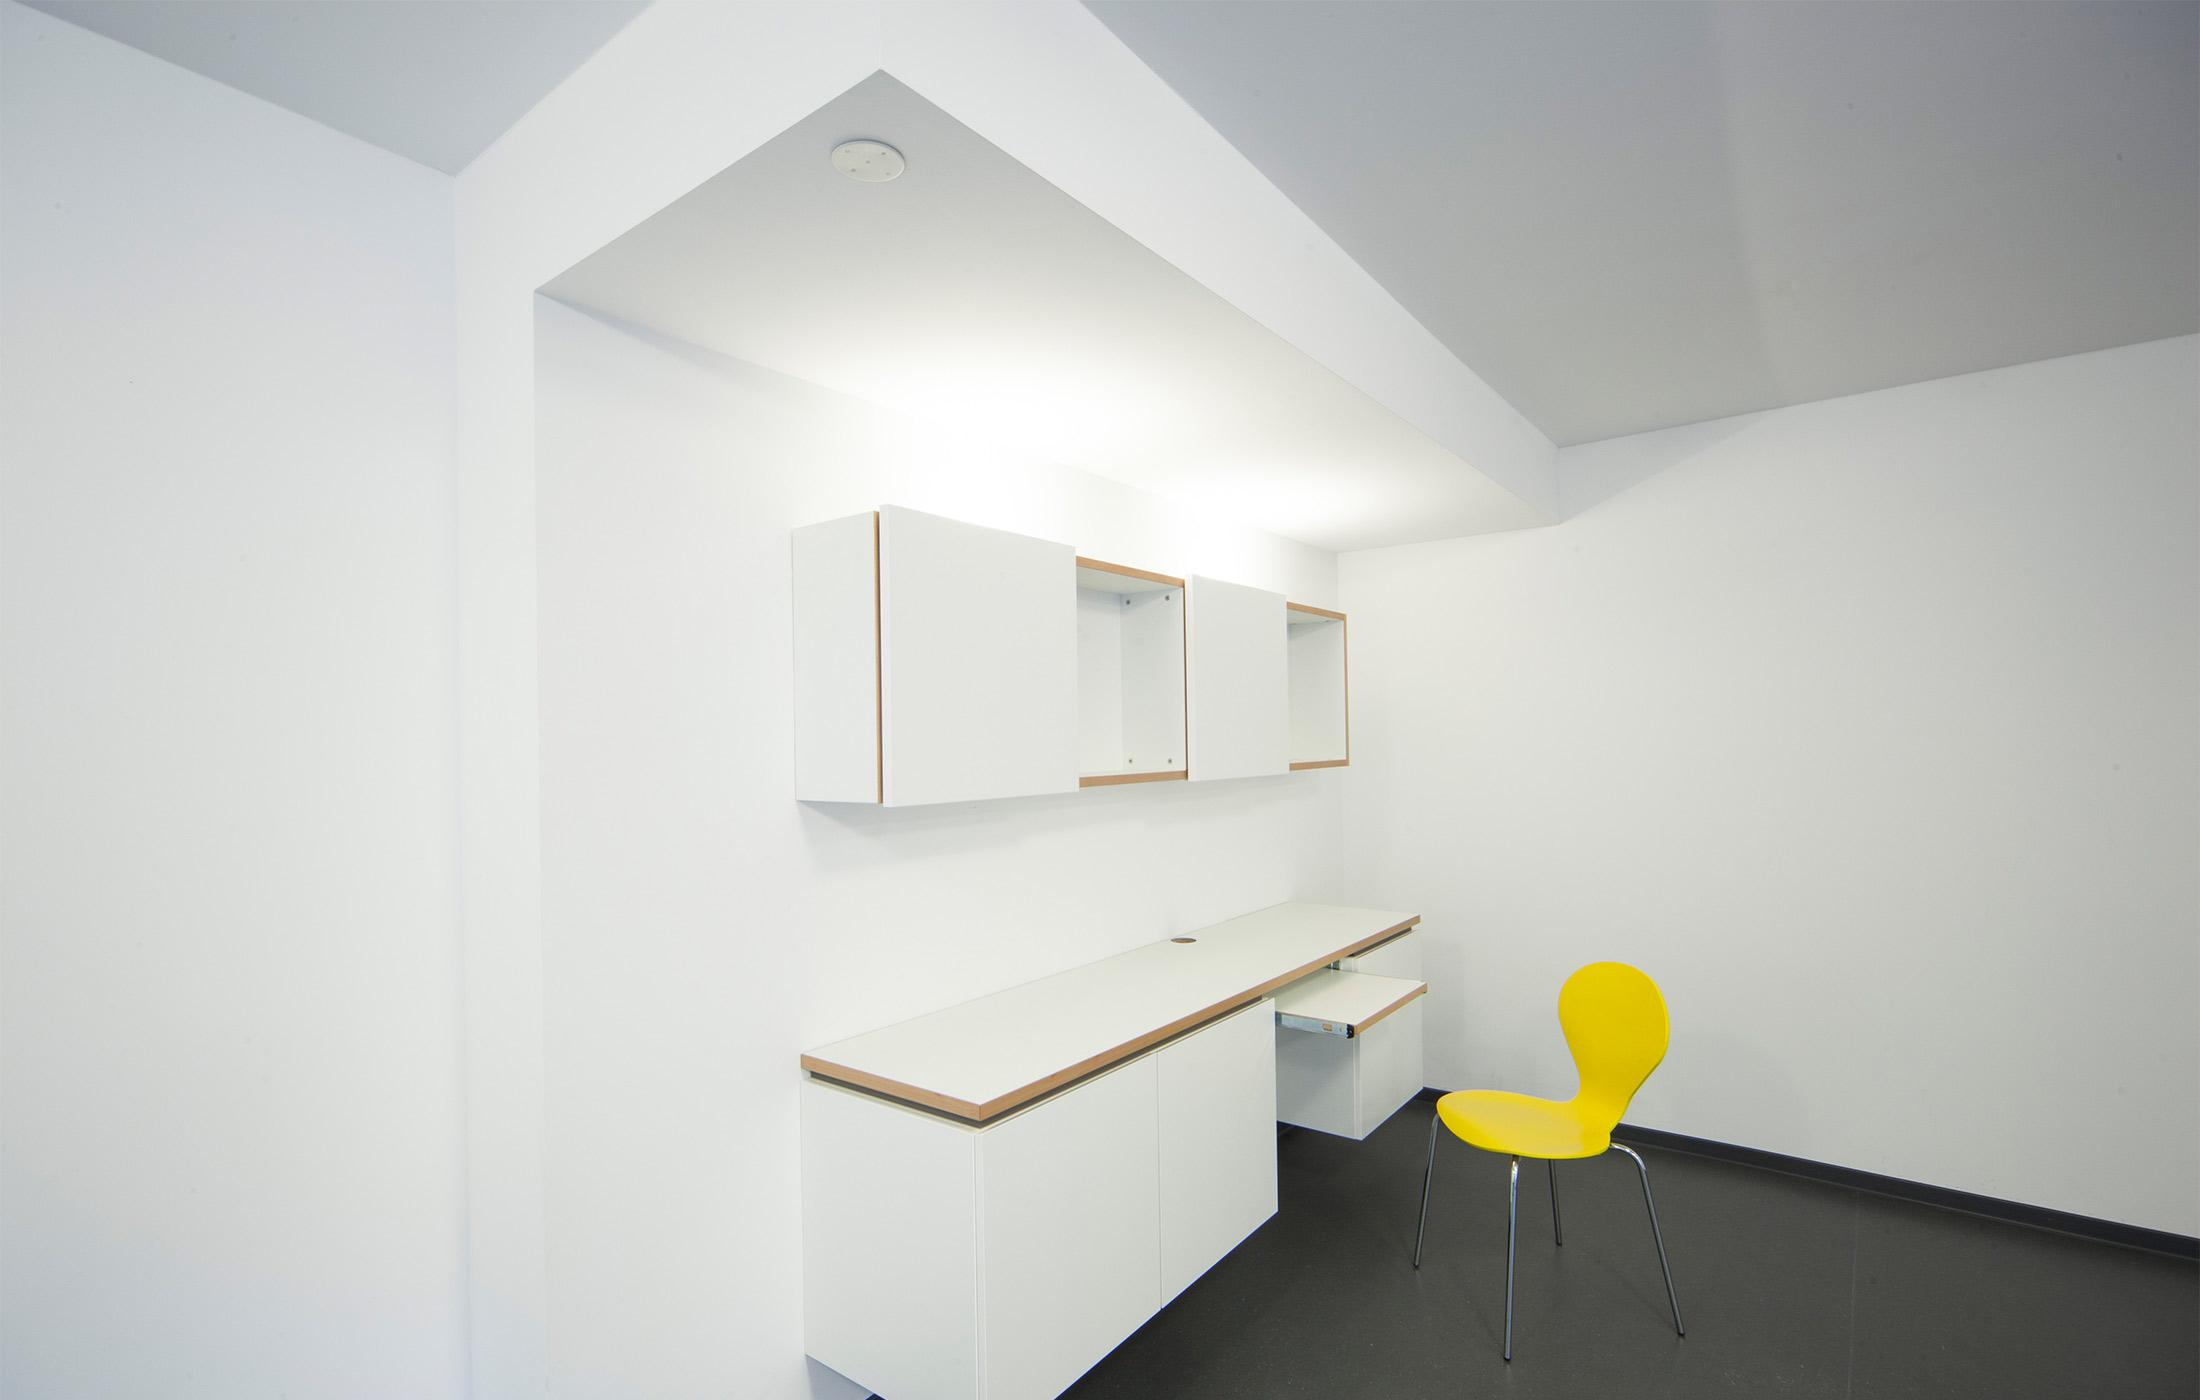 2017, Sanierung Frauenpension Veielbrunnenweg 67, Stuttgart